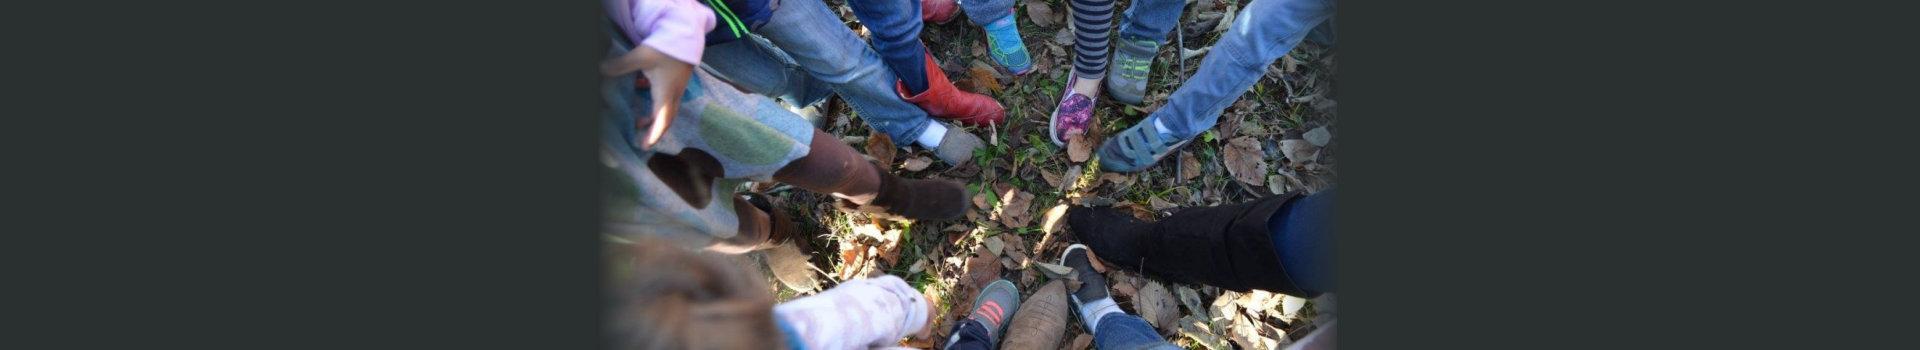 Feet of group of people